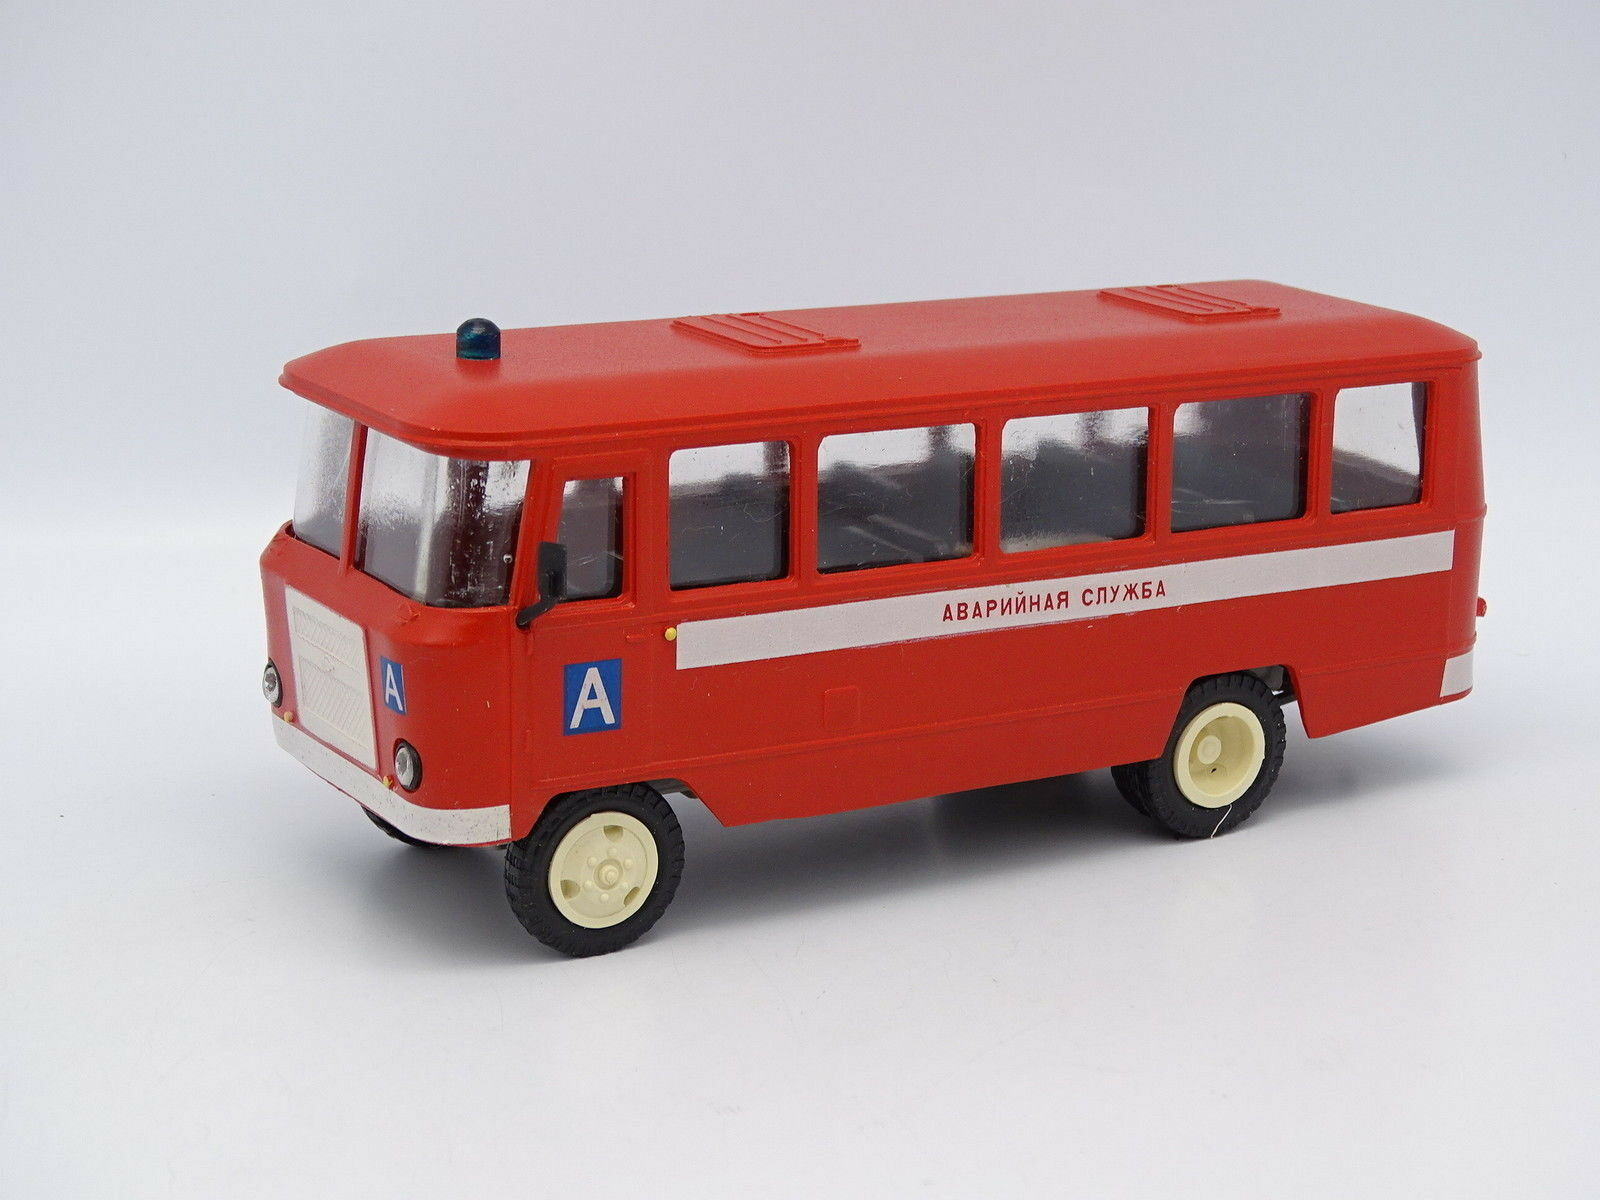 USSR SB 1 43 - Pullman Autobus Kuban G1A1 02 Vigili del fuoco Russie